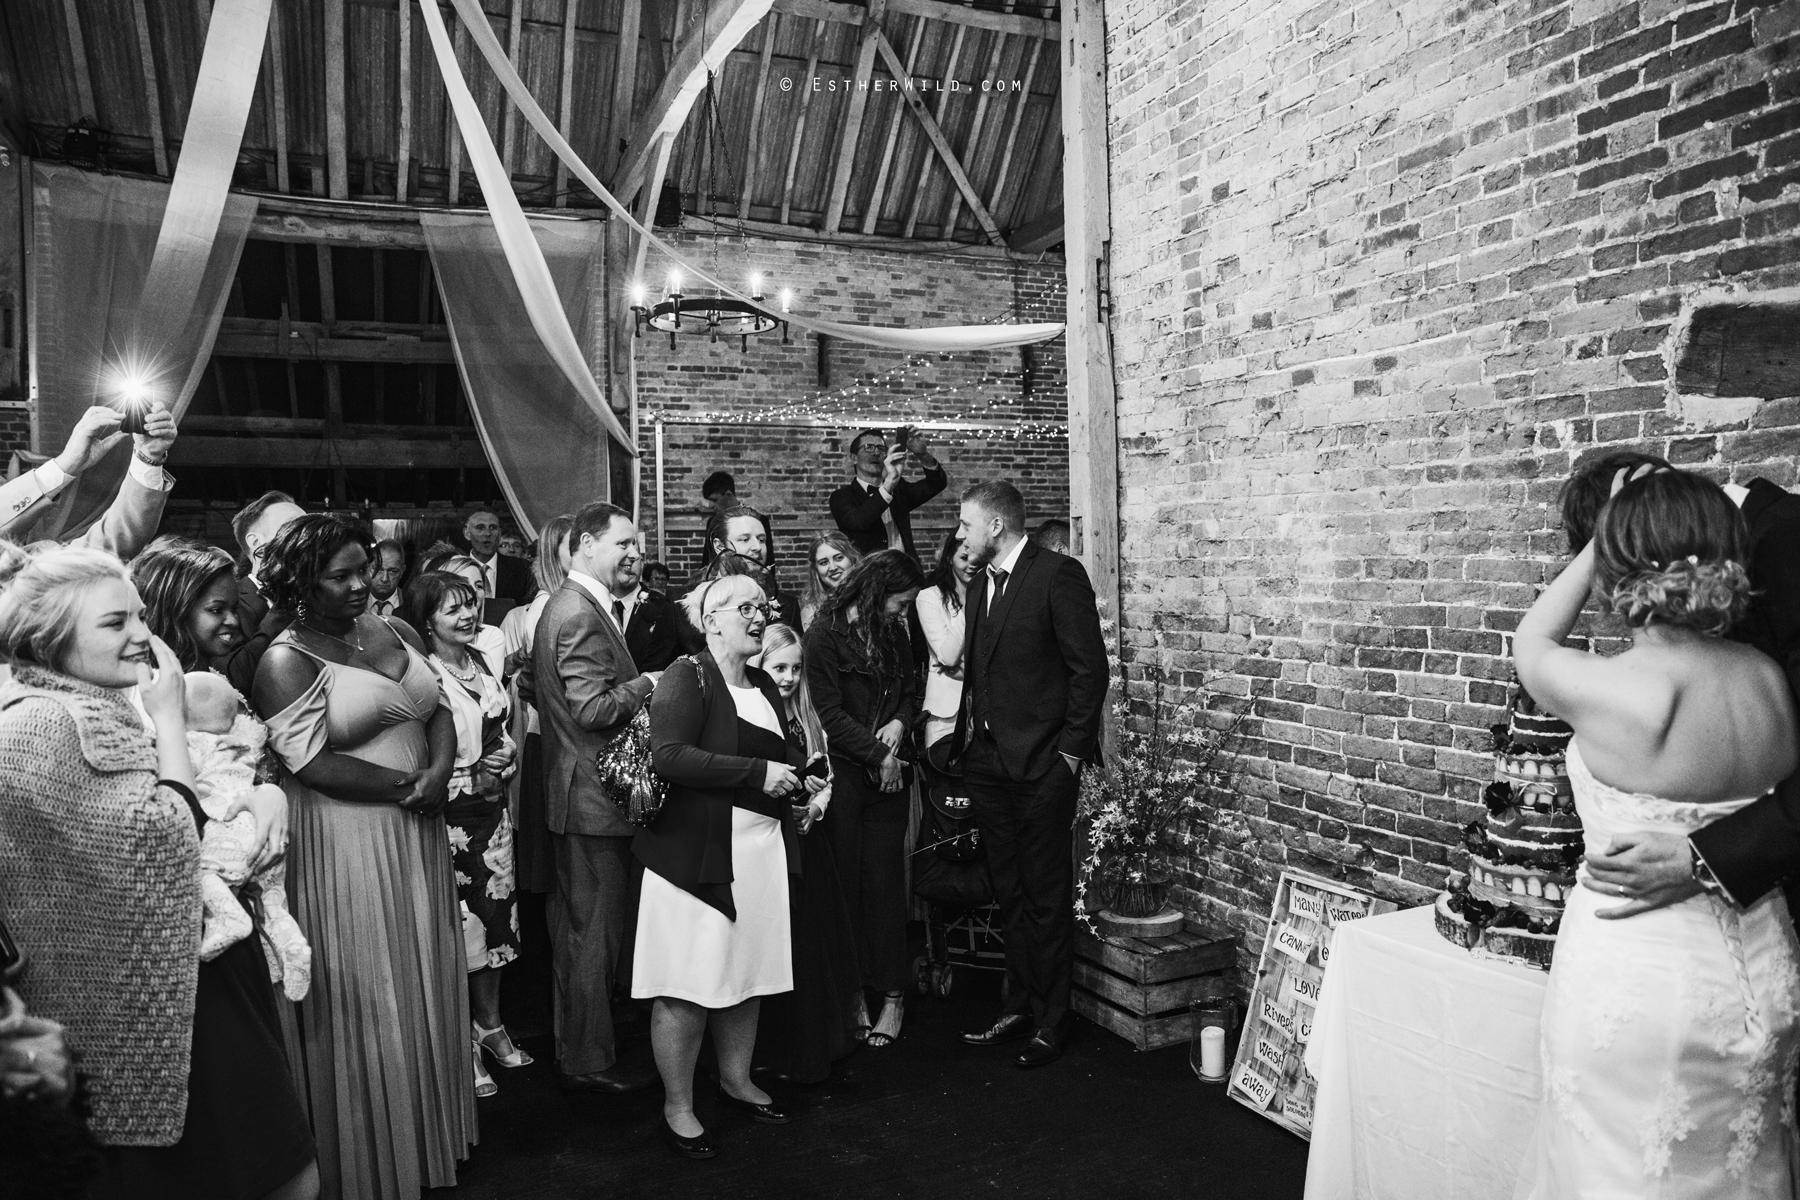 Glebe_Farm_Barn_Rustic_Norfolk_Wedding_Esther_Wild_Photographer_Copyright_IMG_2796-1.jpg